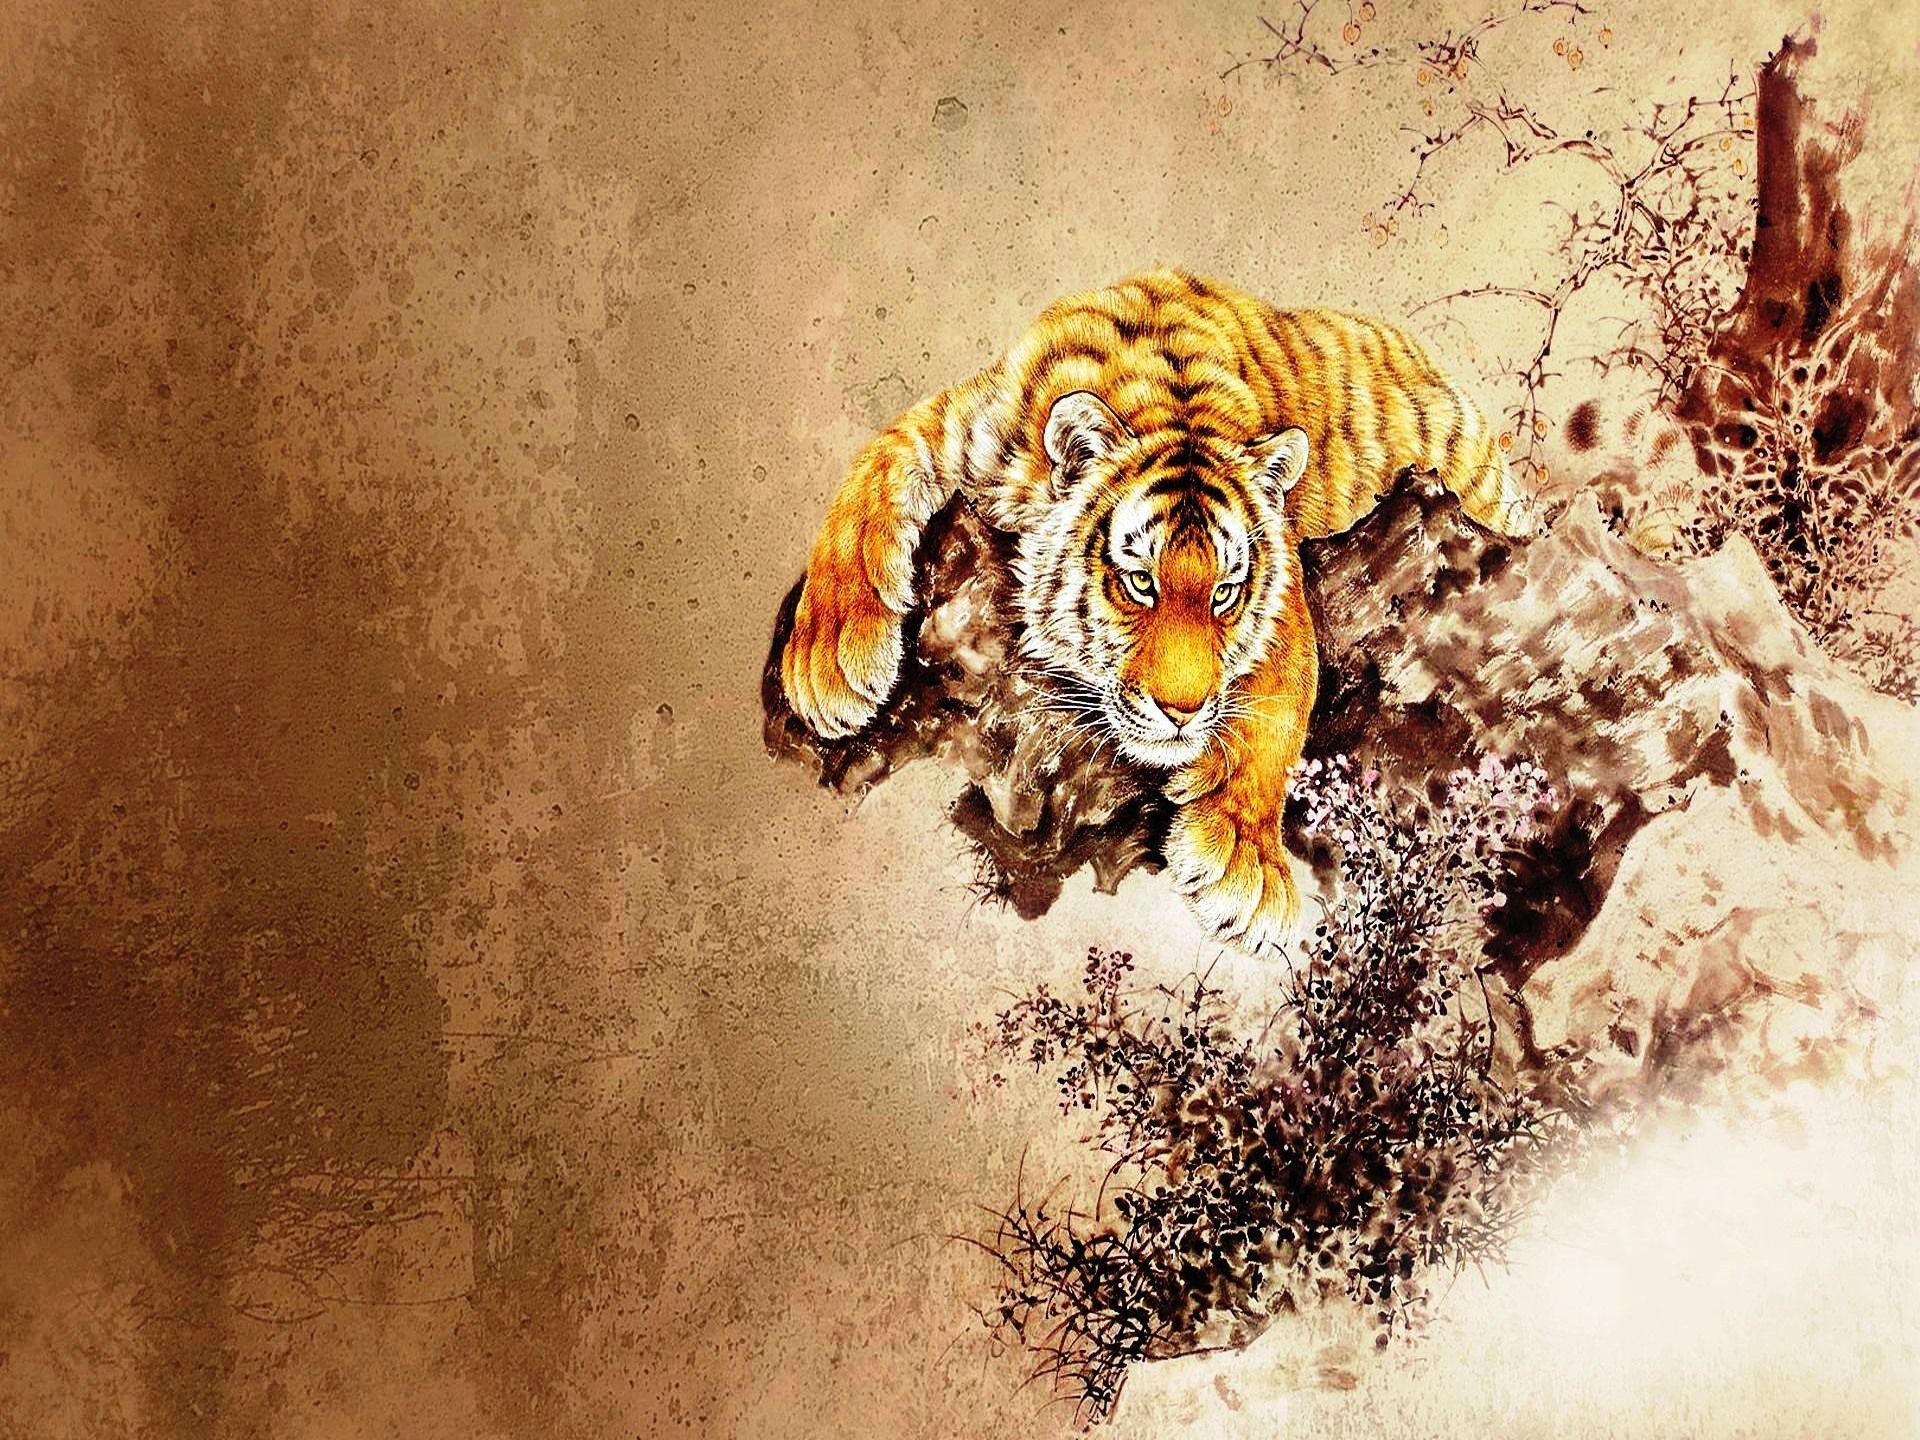 Japanese Tiger Art Wallpapers Top Free Japanese Tiger Art